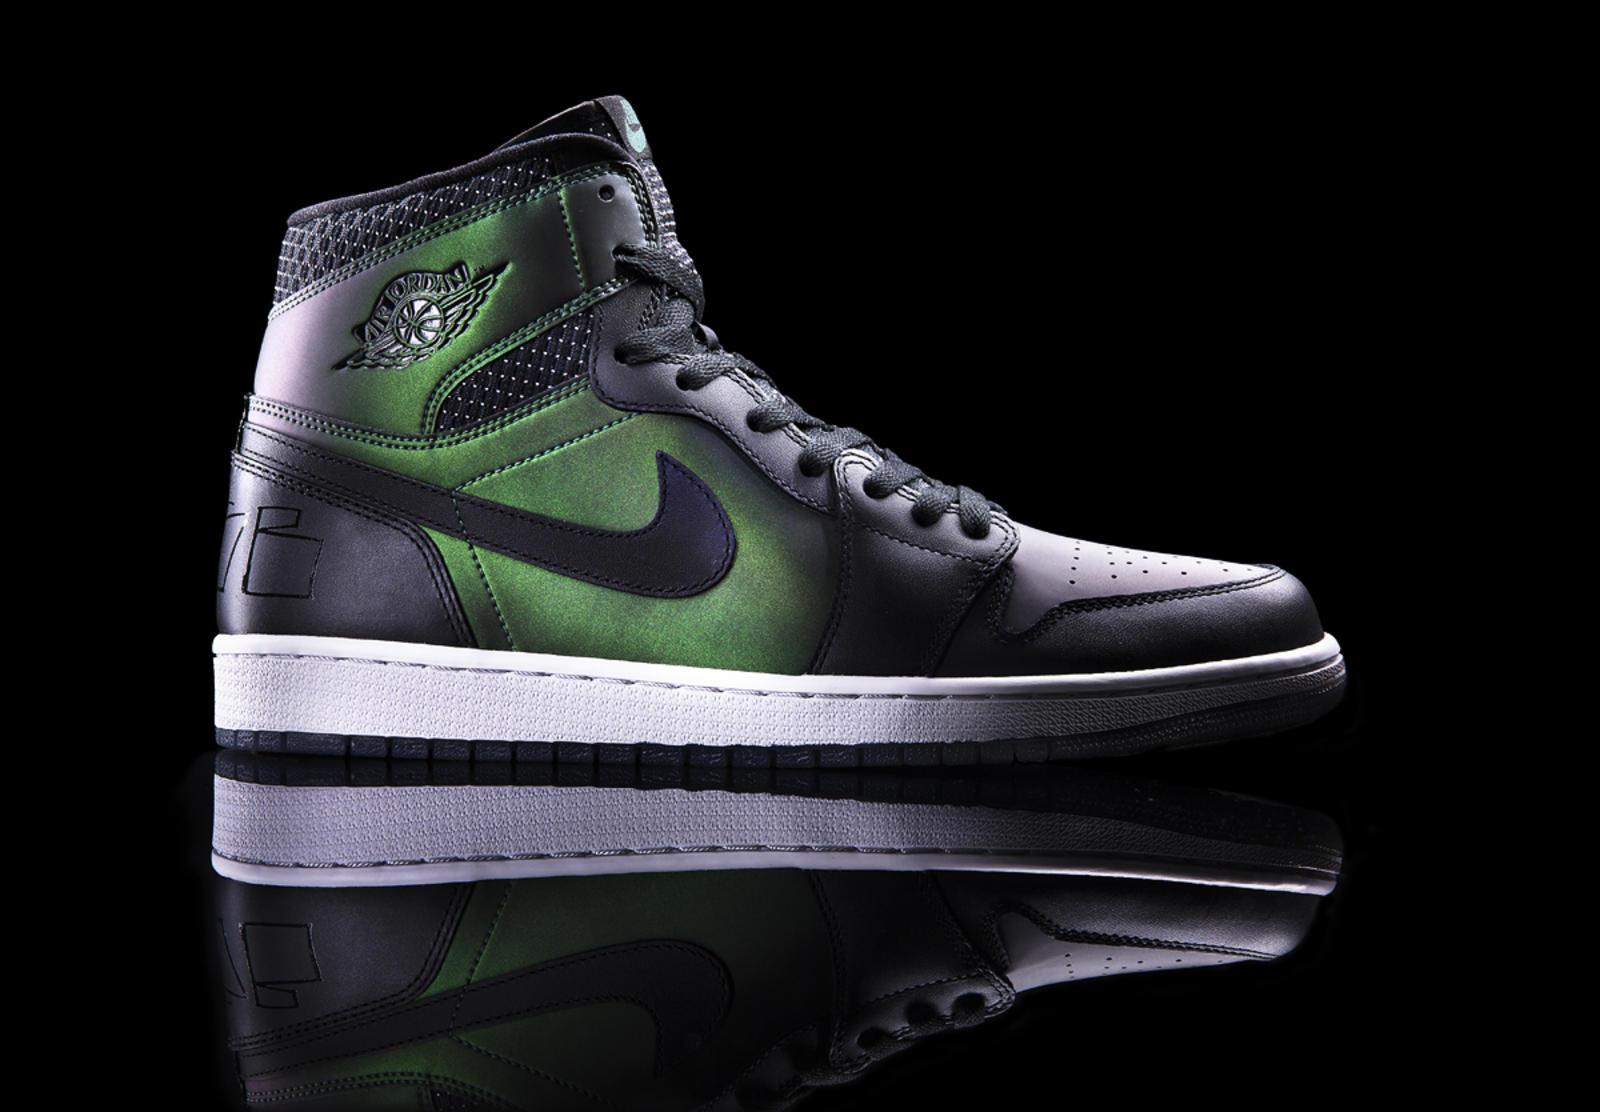 air jordan shoes under 40 dollars